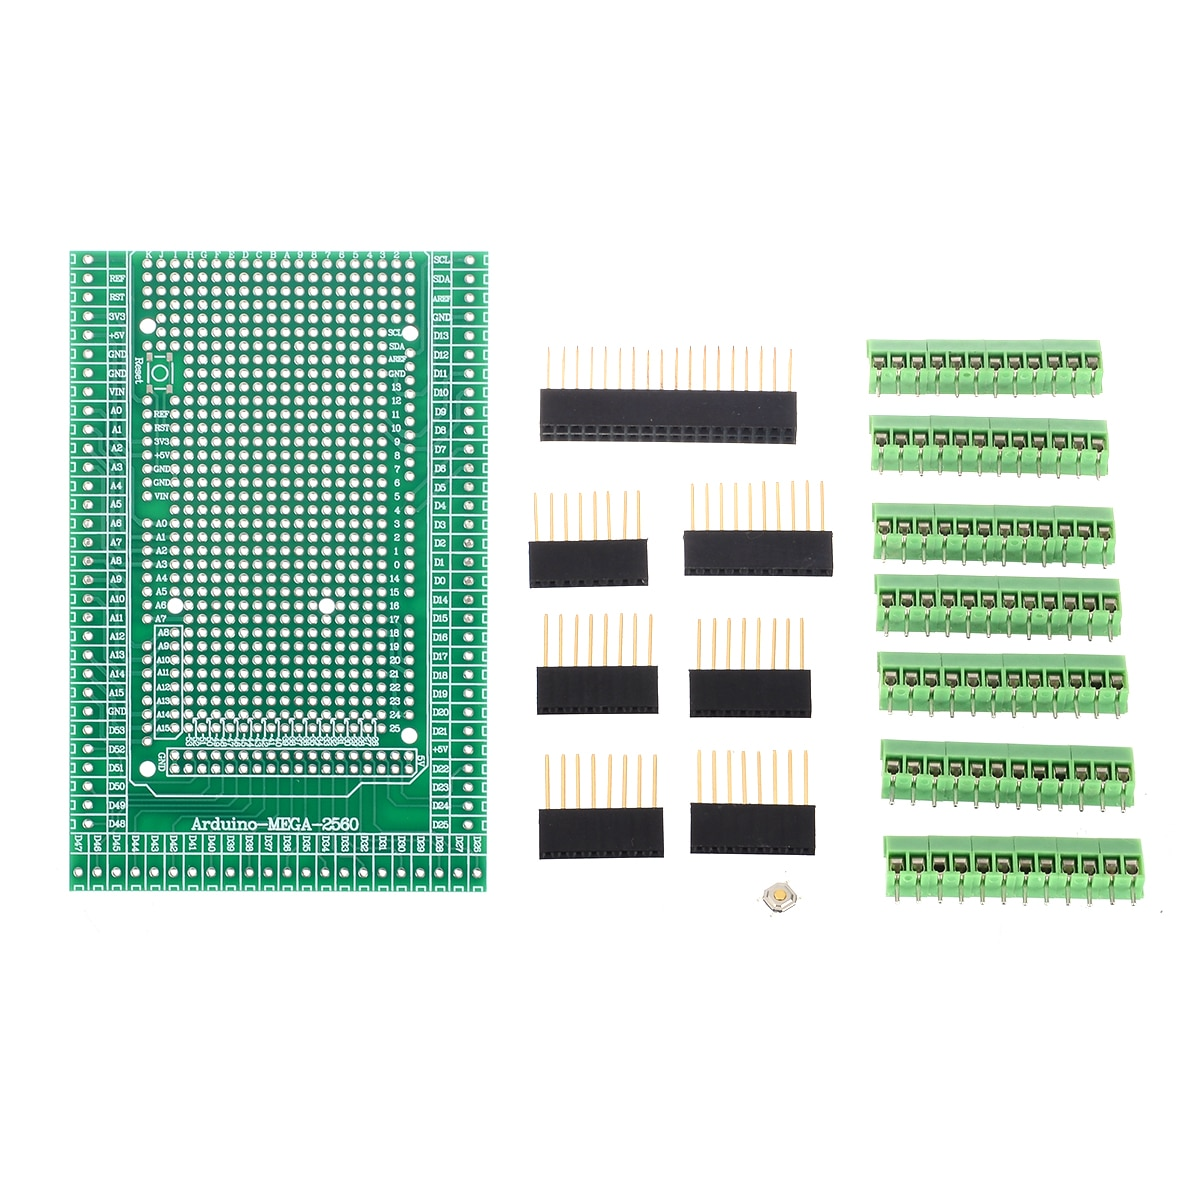 1Set Durable Terminal Block MEGA-2560 Prototype Screw Terminal Block Shield Board Female Header Sockets Kit For Arduino